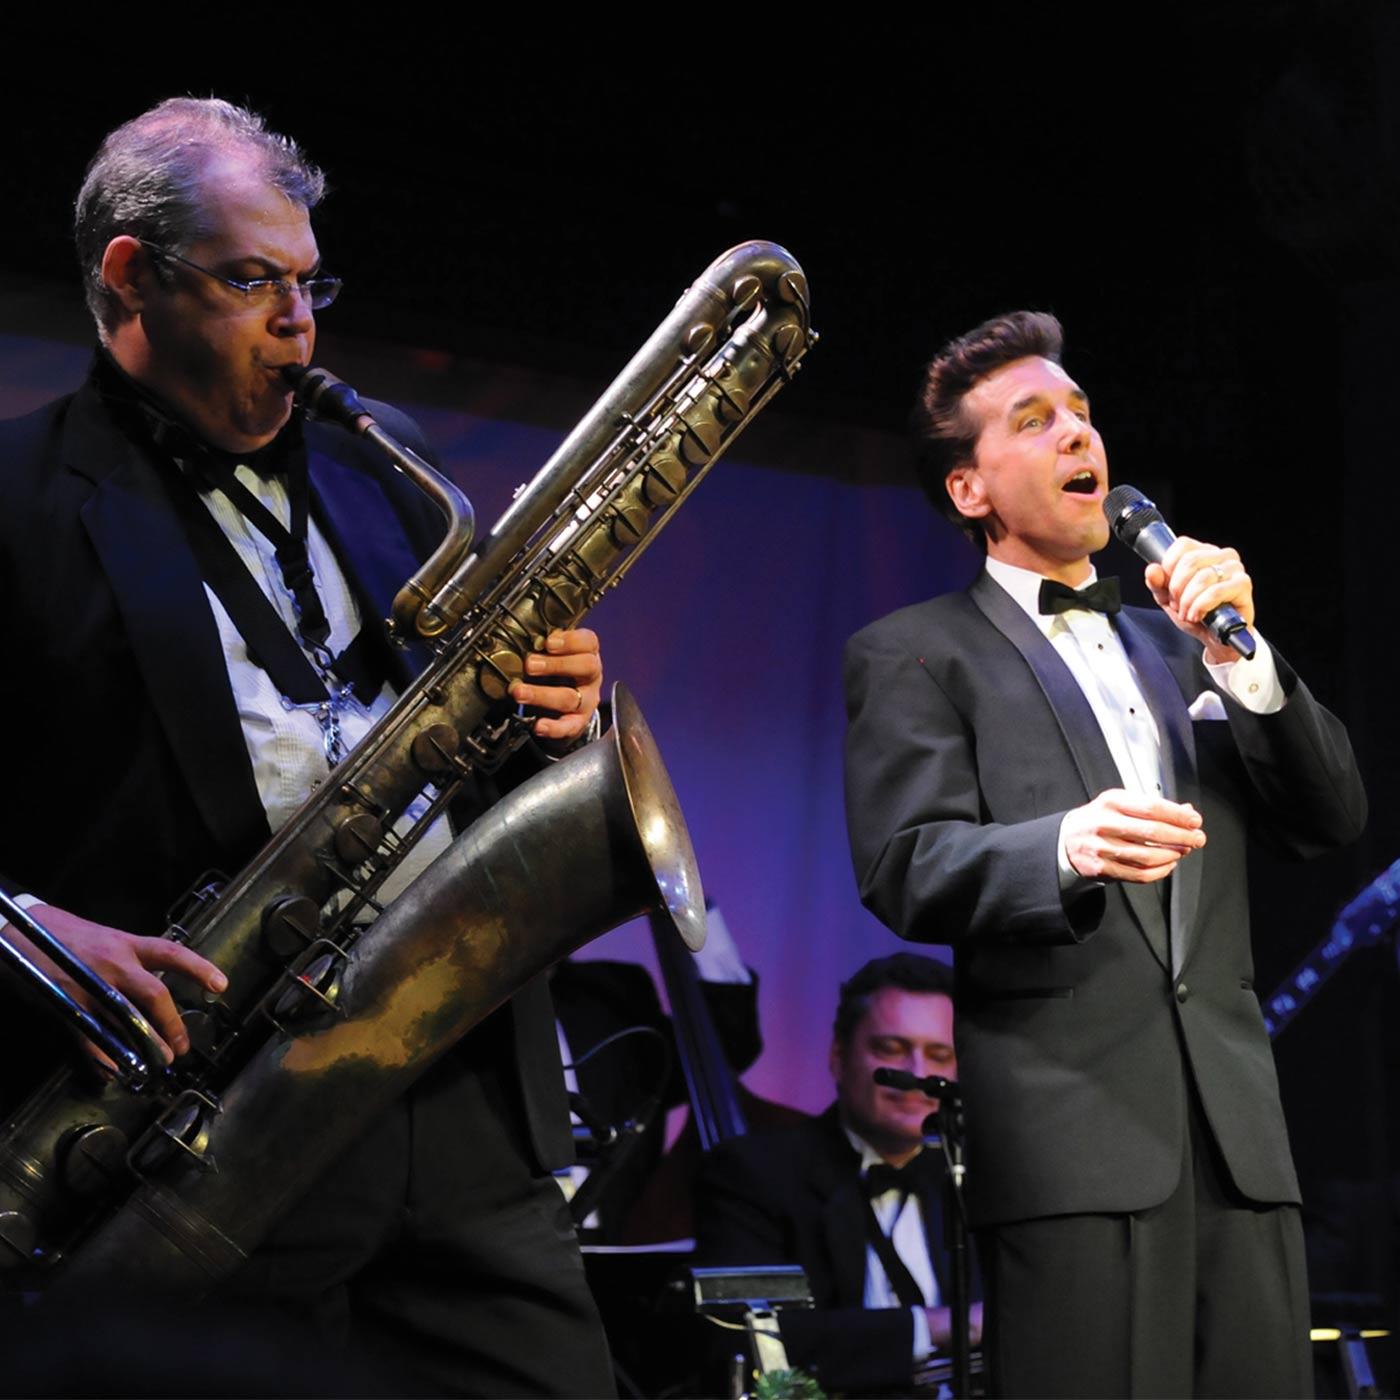 The Gershwin Big Band: American Rhapsody